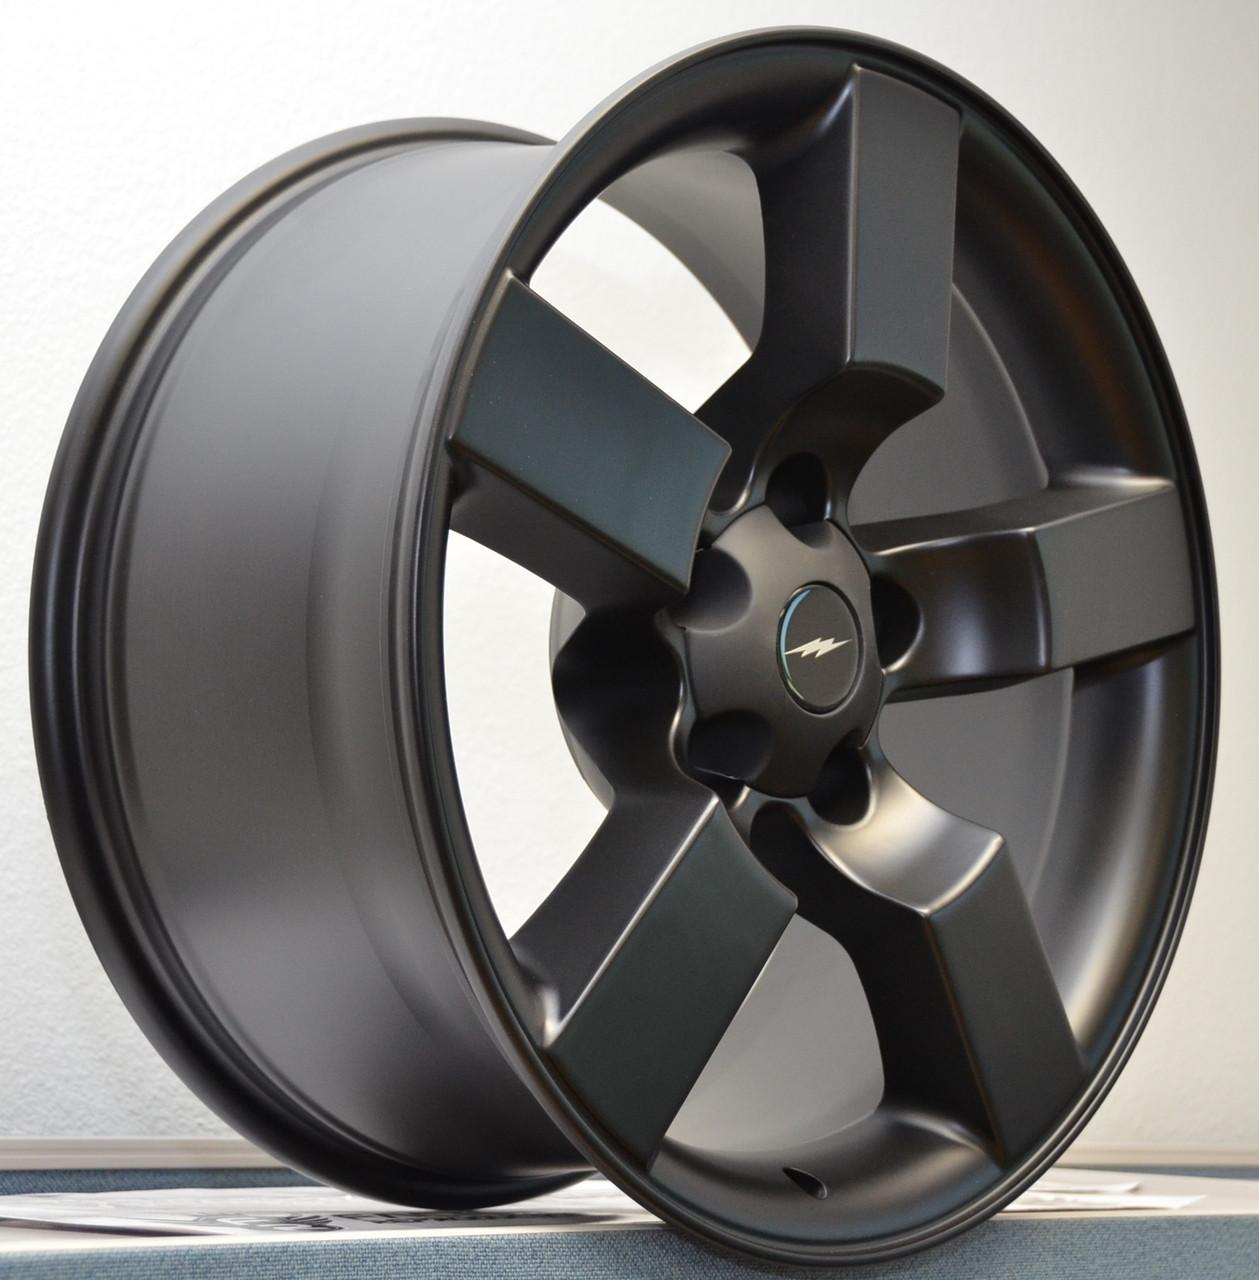 20 satin black ford f150 lightning expedition alloy wheels rims tires set